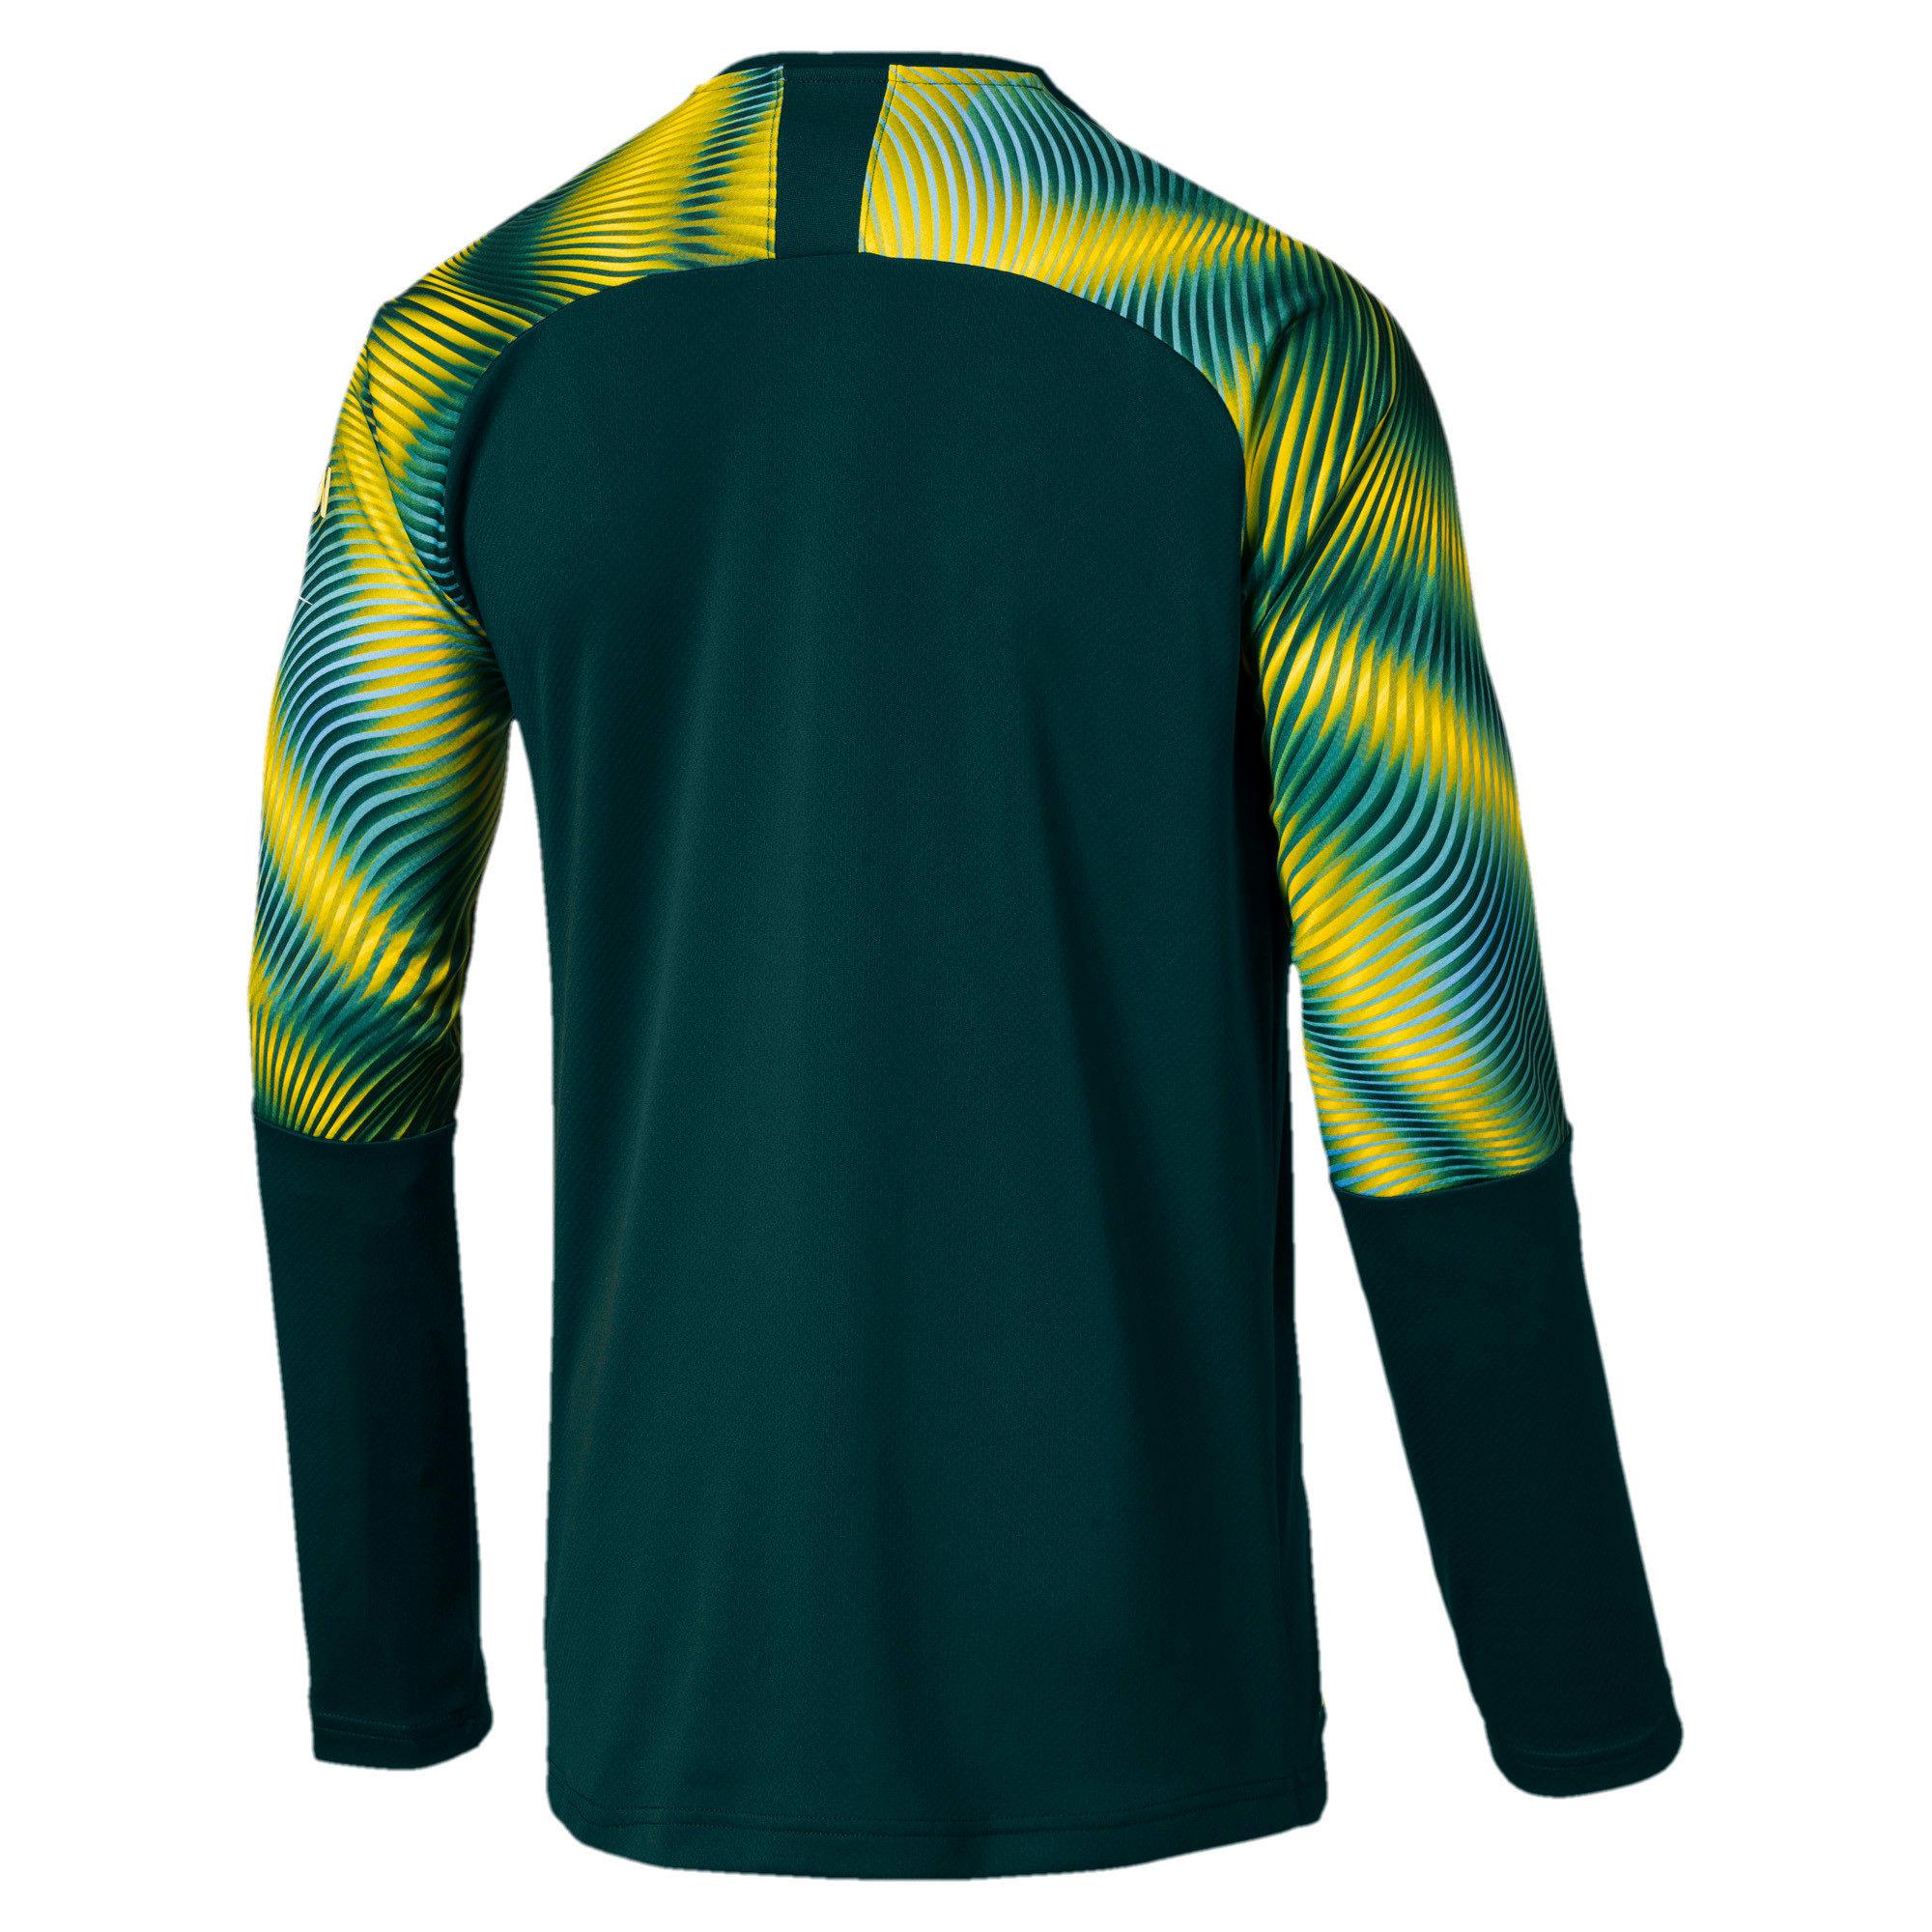 Thumbnail 2 of Manchester City FC Men's Goalkeeper Replica Jersey, Ponderosa Pine-Cyber Yellow, medium